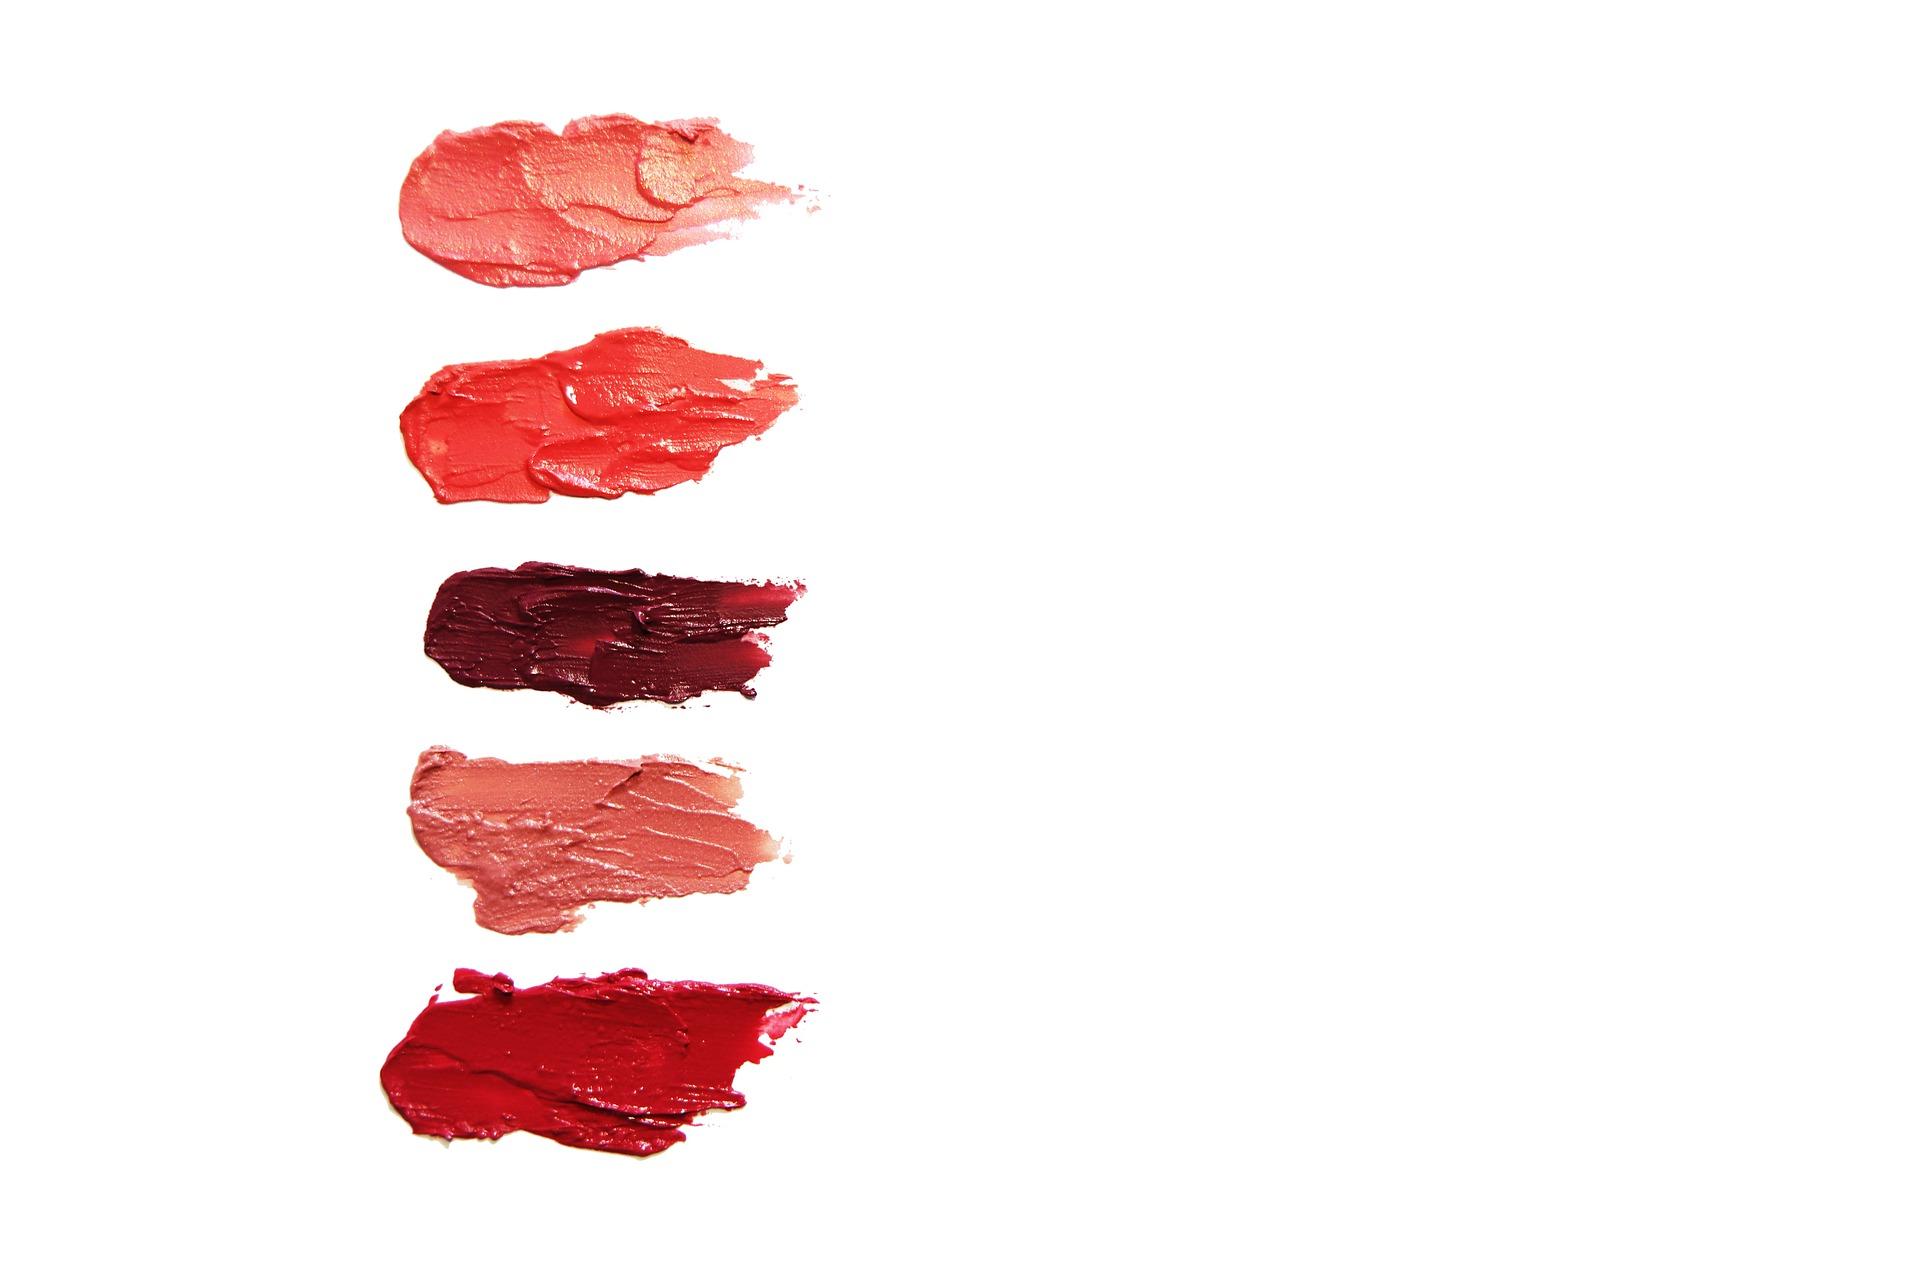 Lipstick smear - June 14